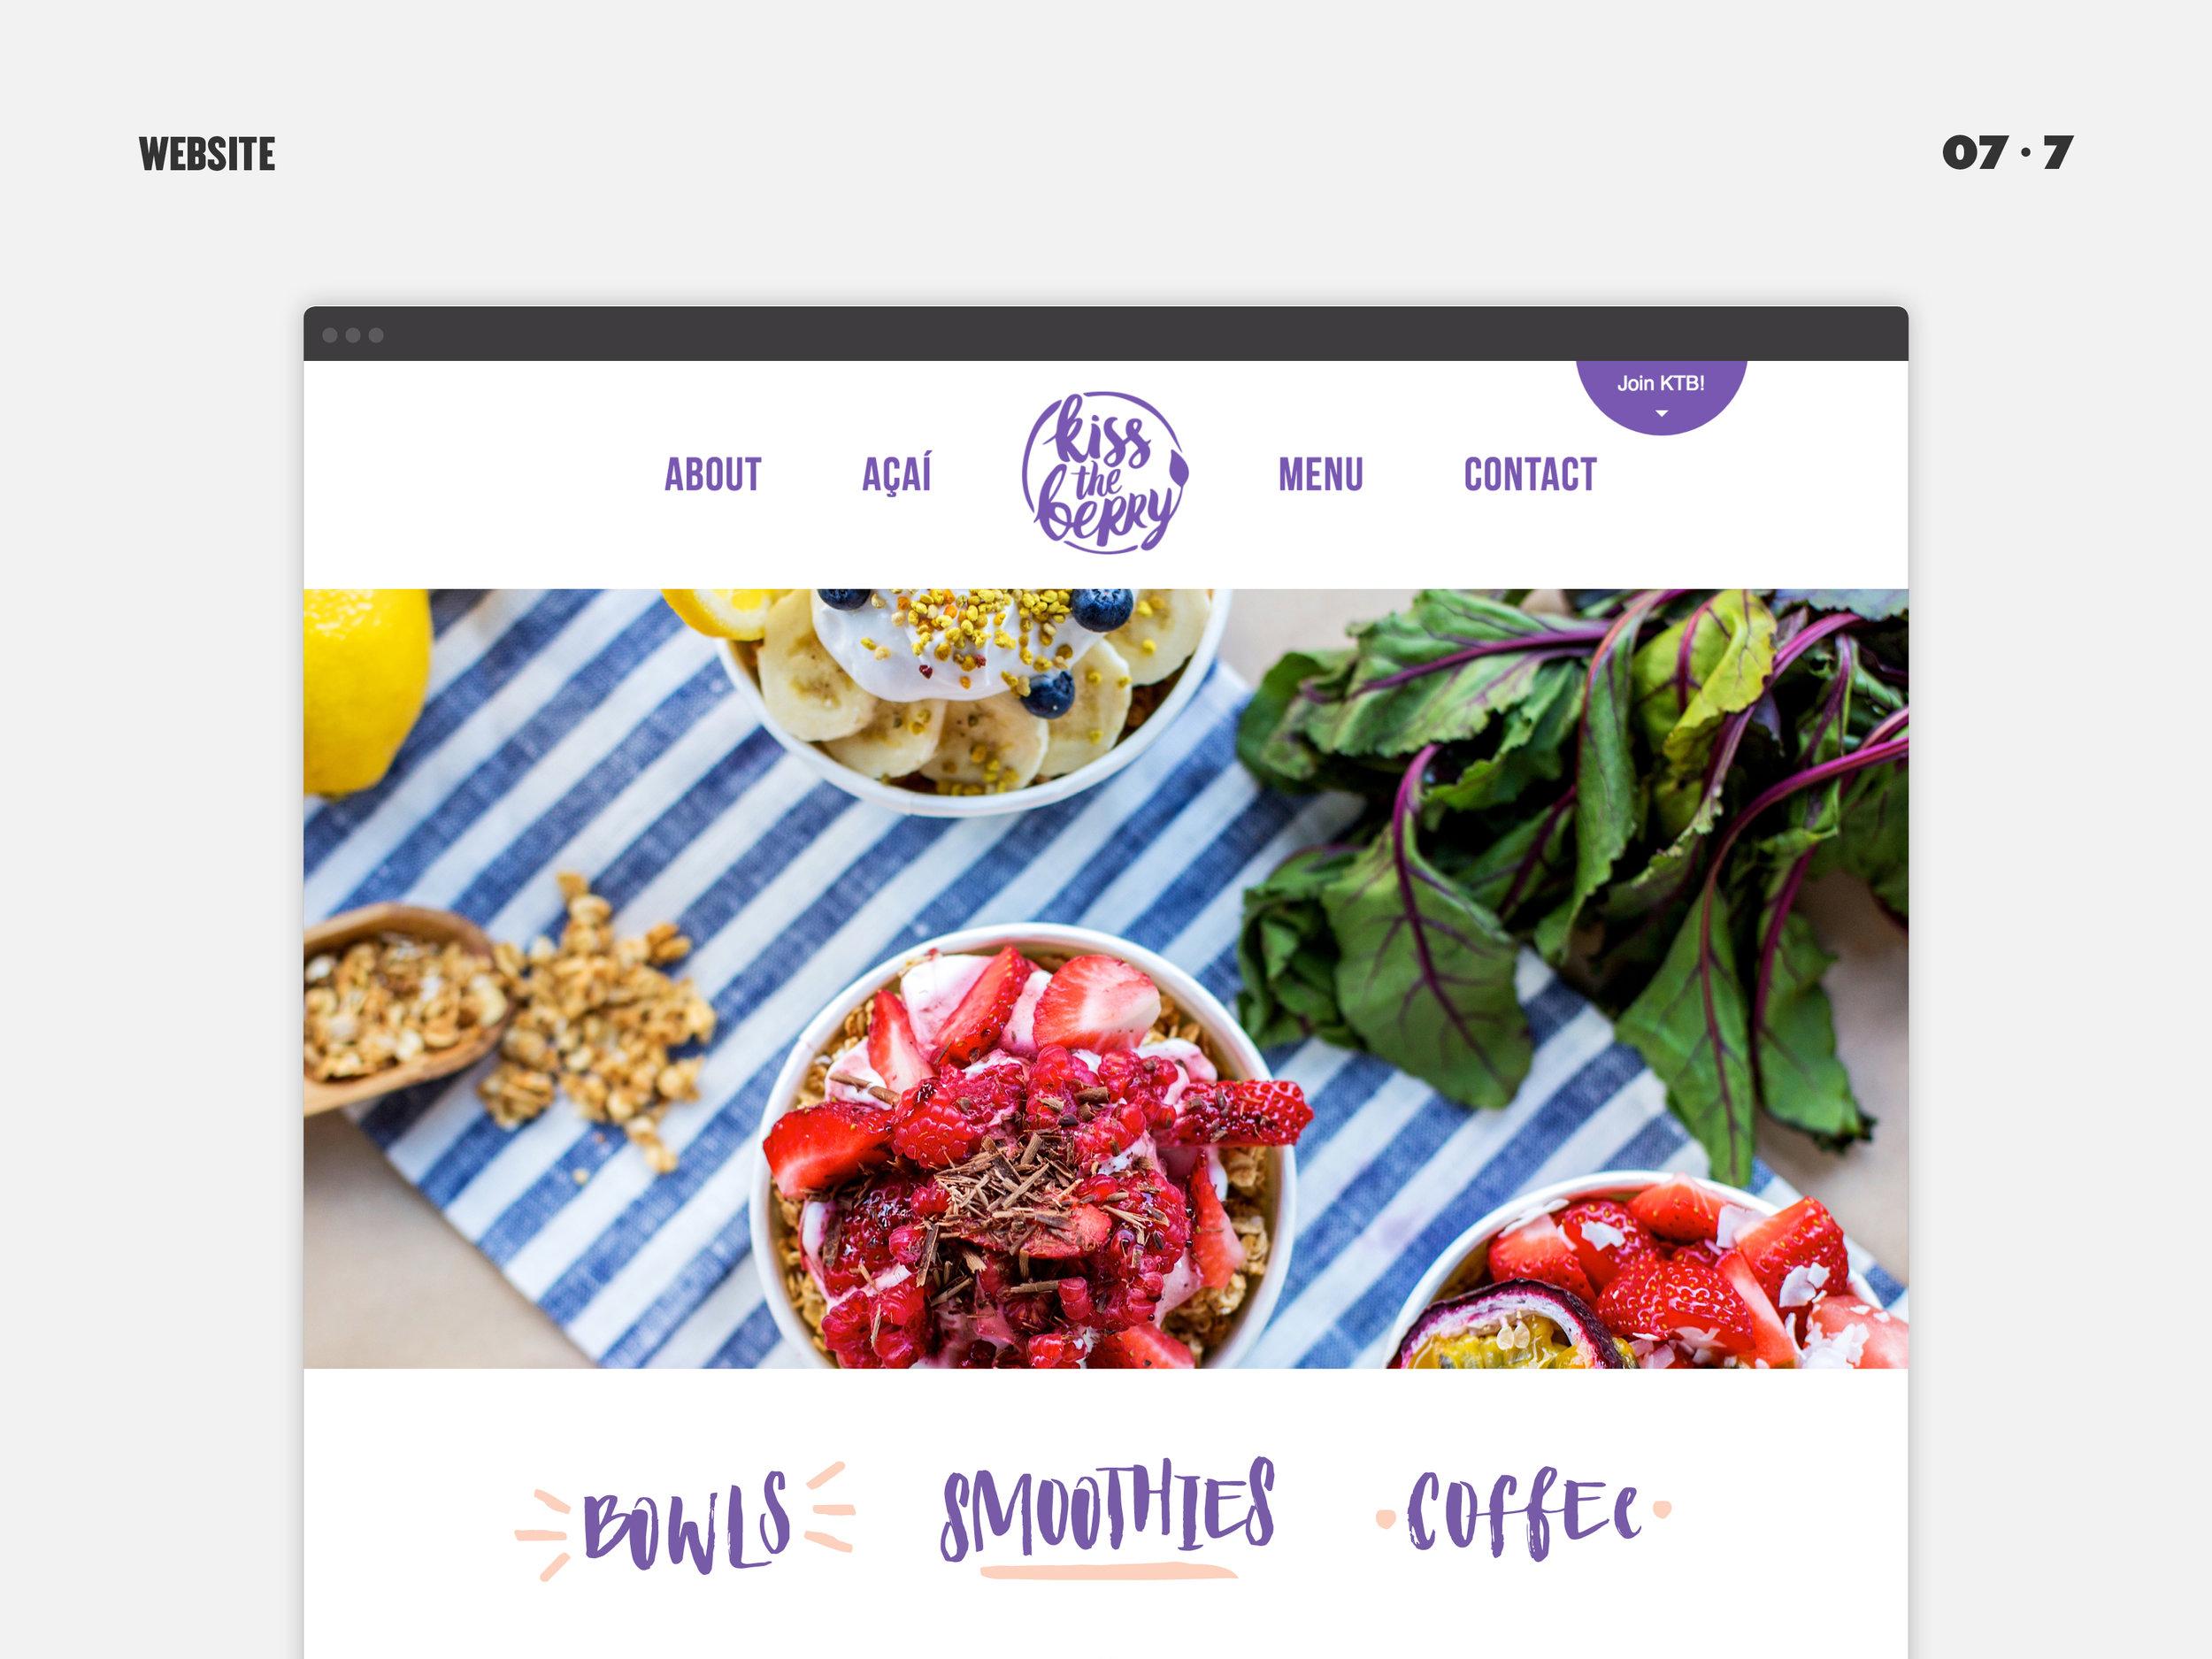 kisstheberry-project-web-7.jpg